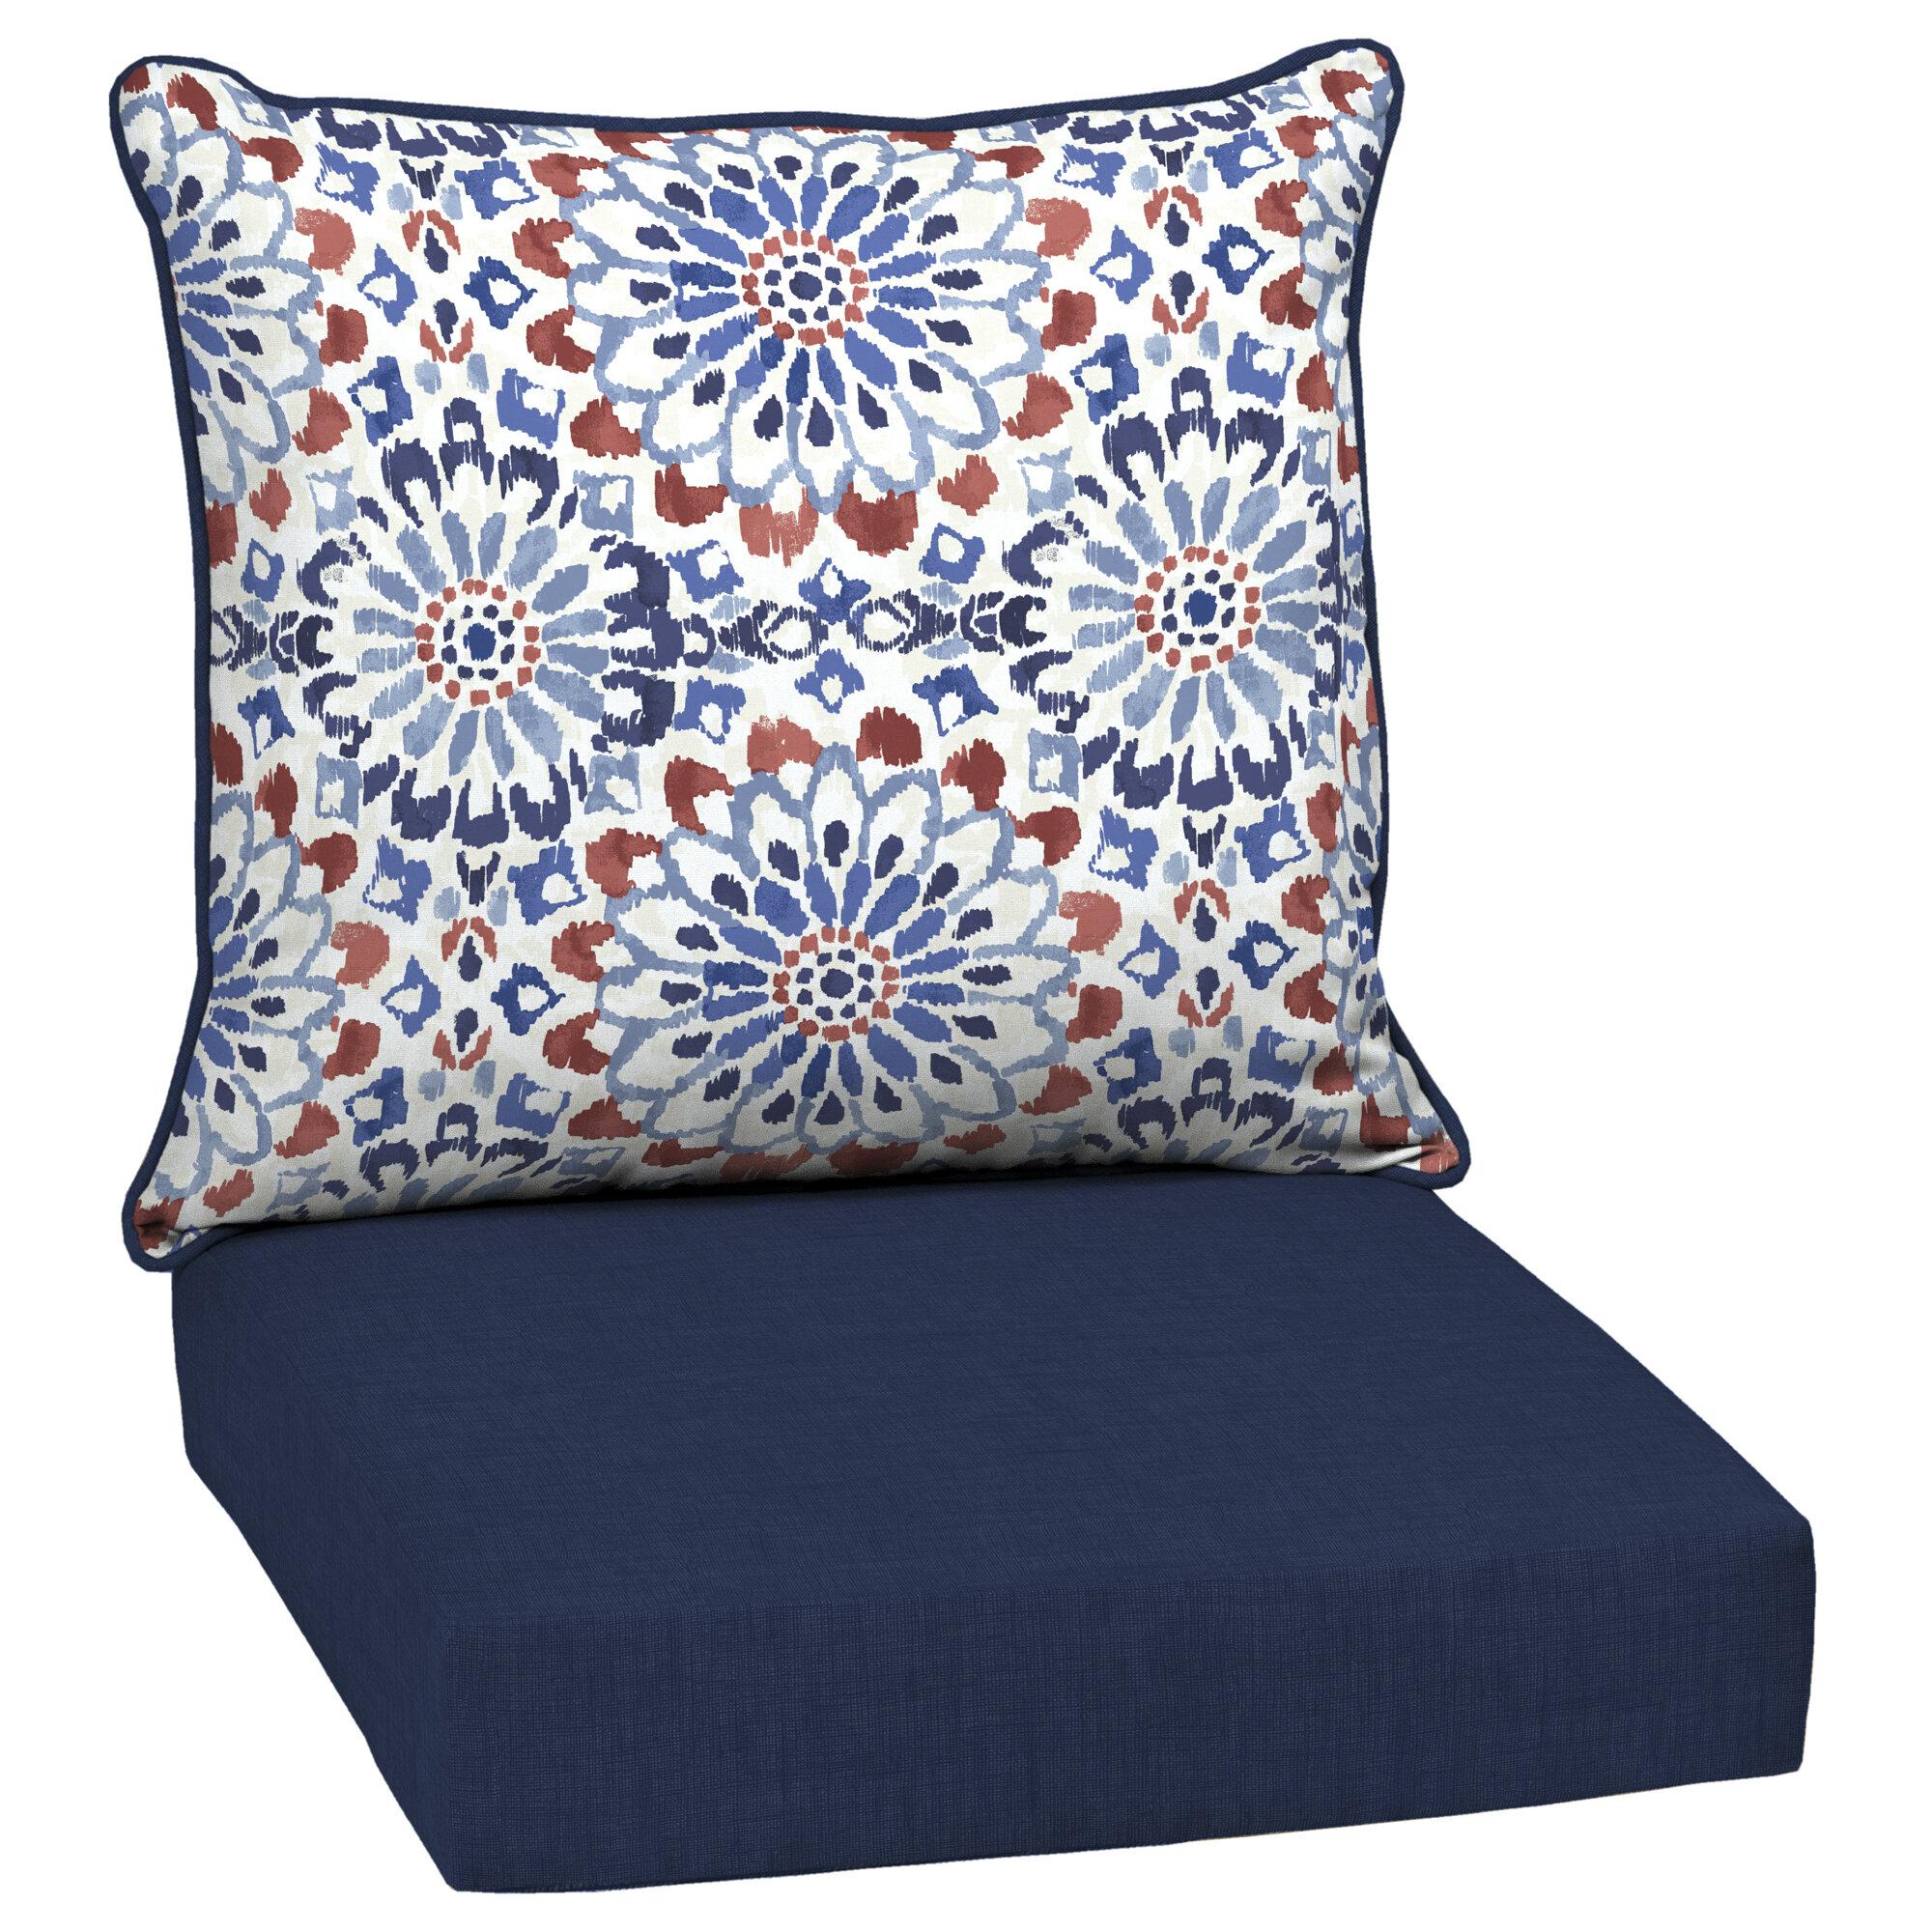 Fabulous Outdoor Lounge Chair Cushion Cjindustries Chair Design For Home Cjindustriesco